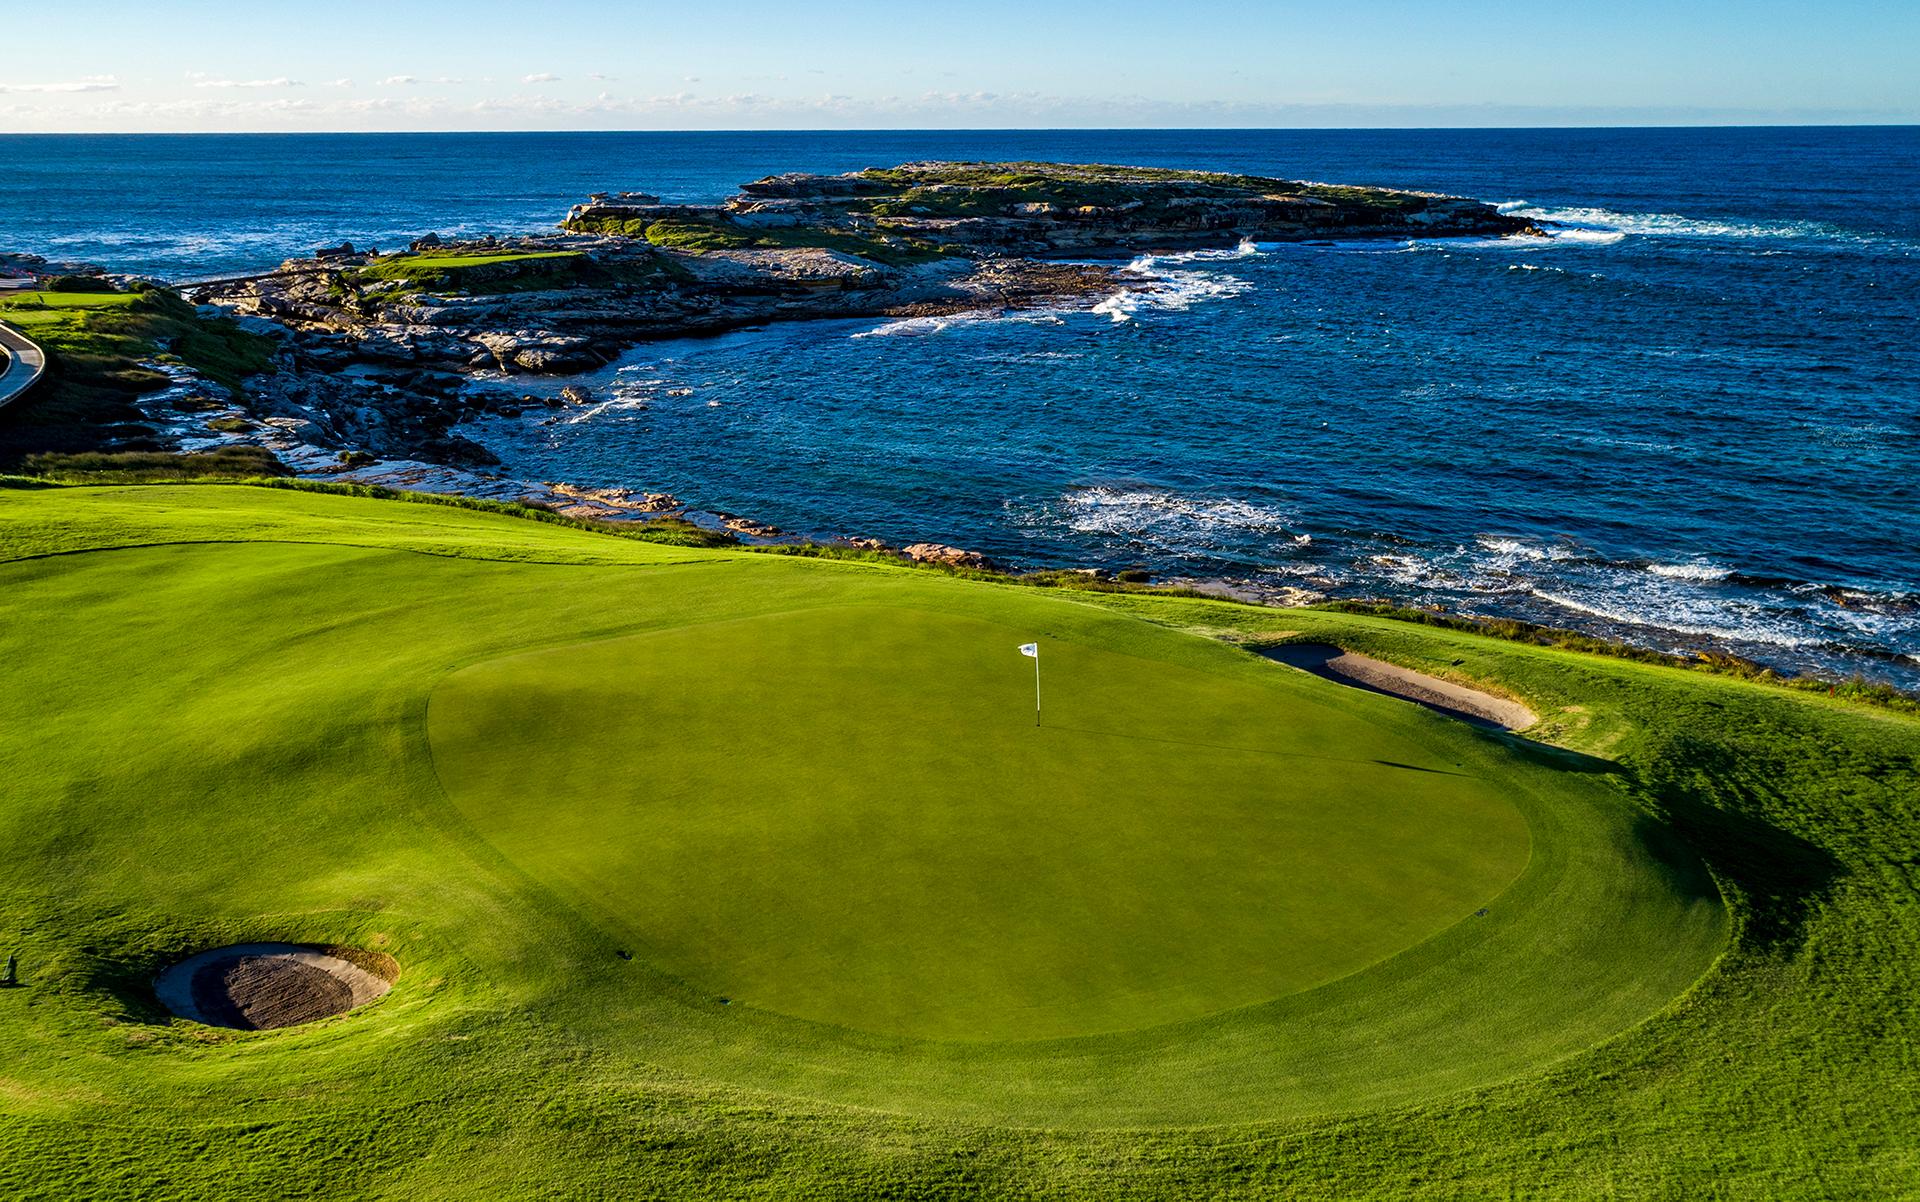 https://bubo.sk/uploads/galleries/5026/nsw-golf-club-6th-green.jpg